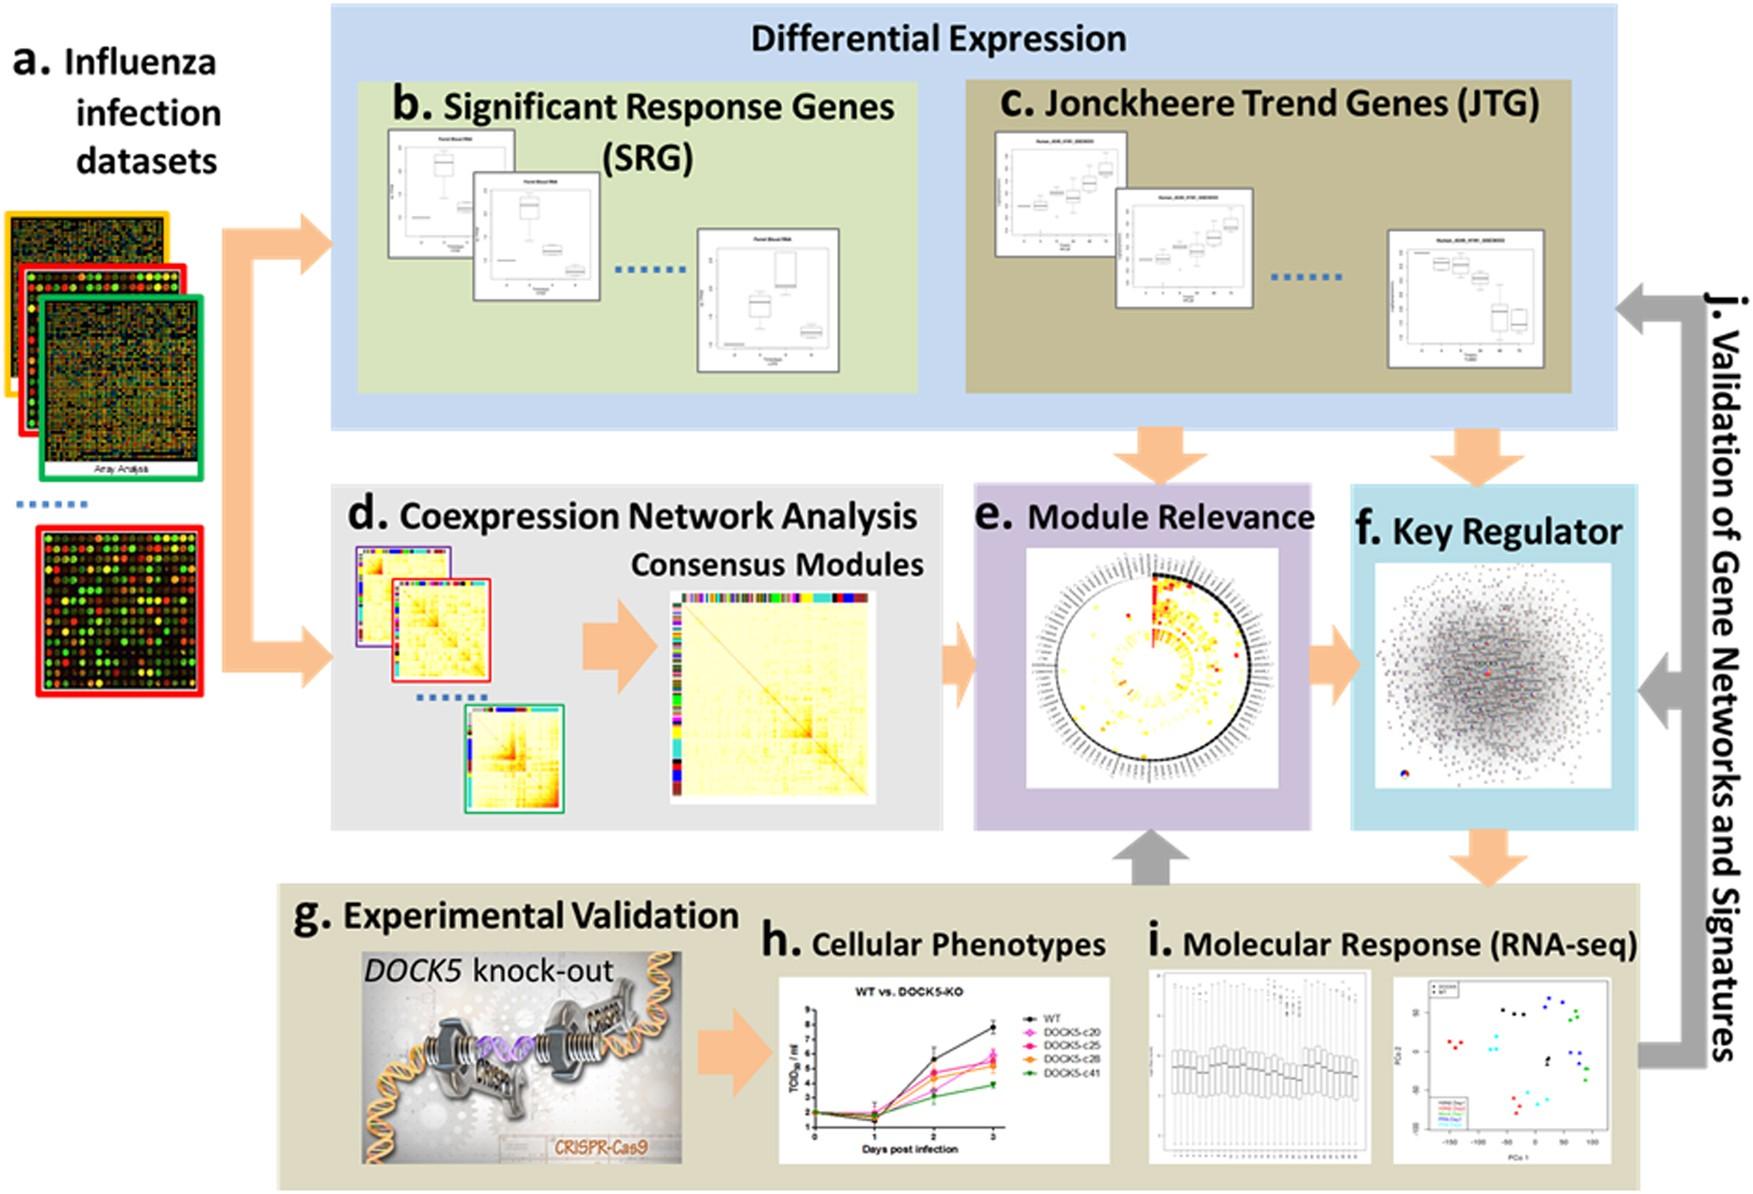 Integrative Gene Network Analysis Identifies Key Signatures